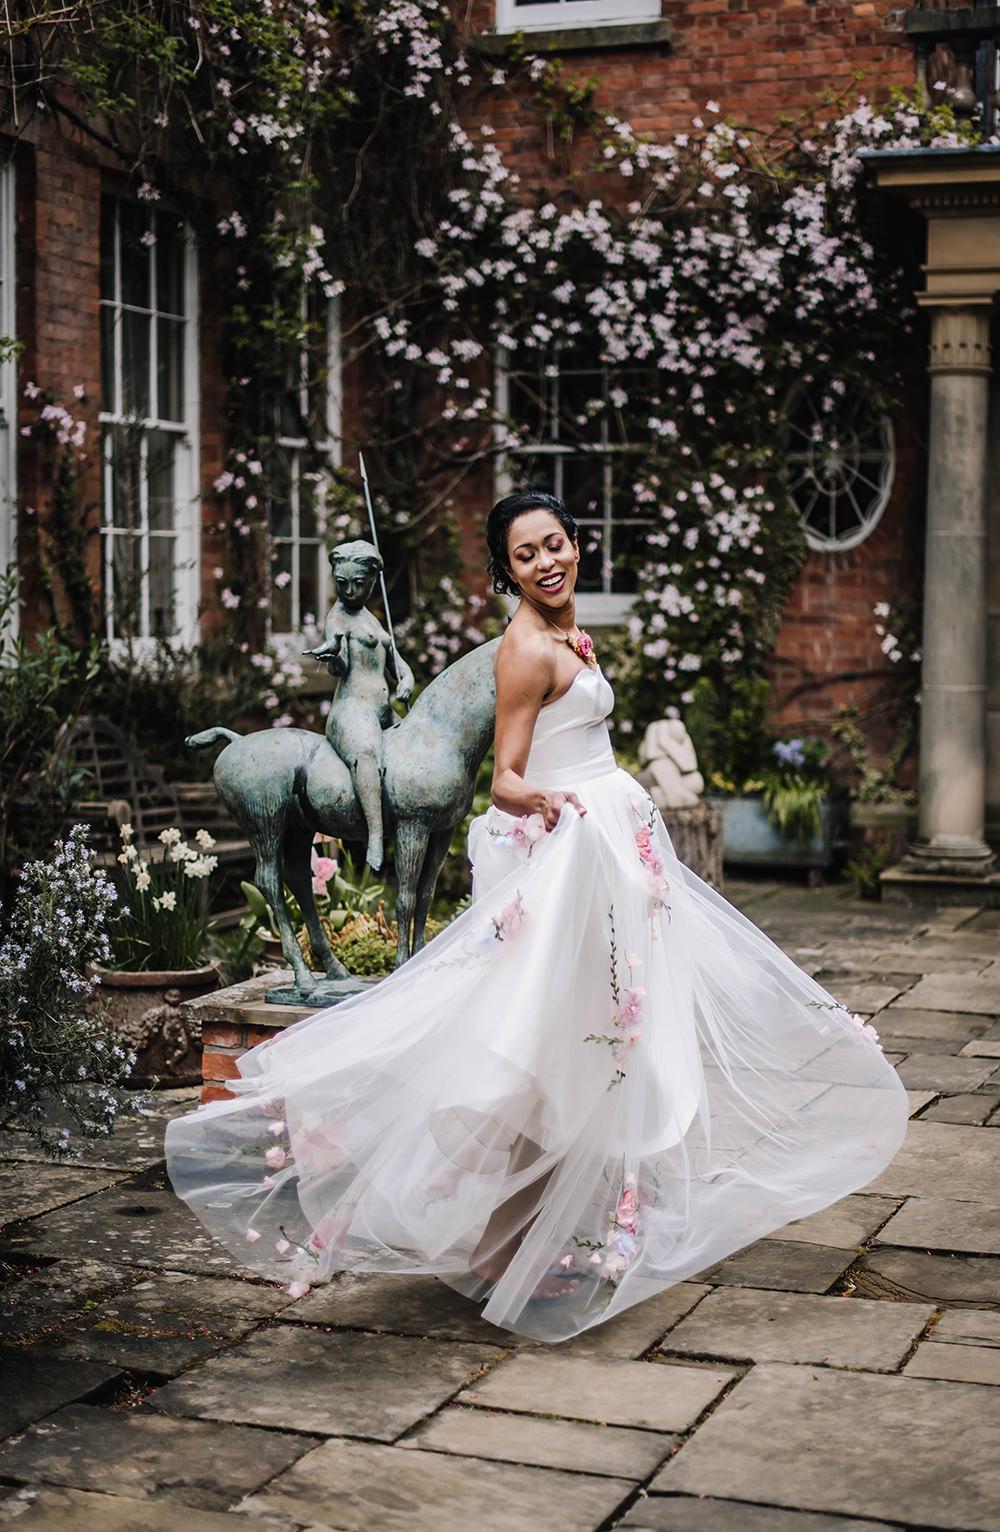 Bride Bridal Dress Gown Veil Embroidered Flowers Strapless Coral Floral Wedding Ideas Birgitta Zoutman Photography